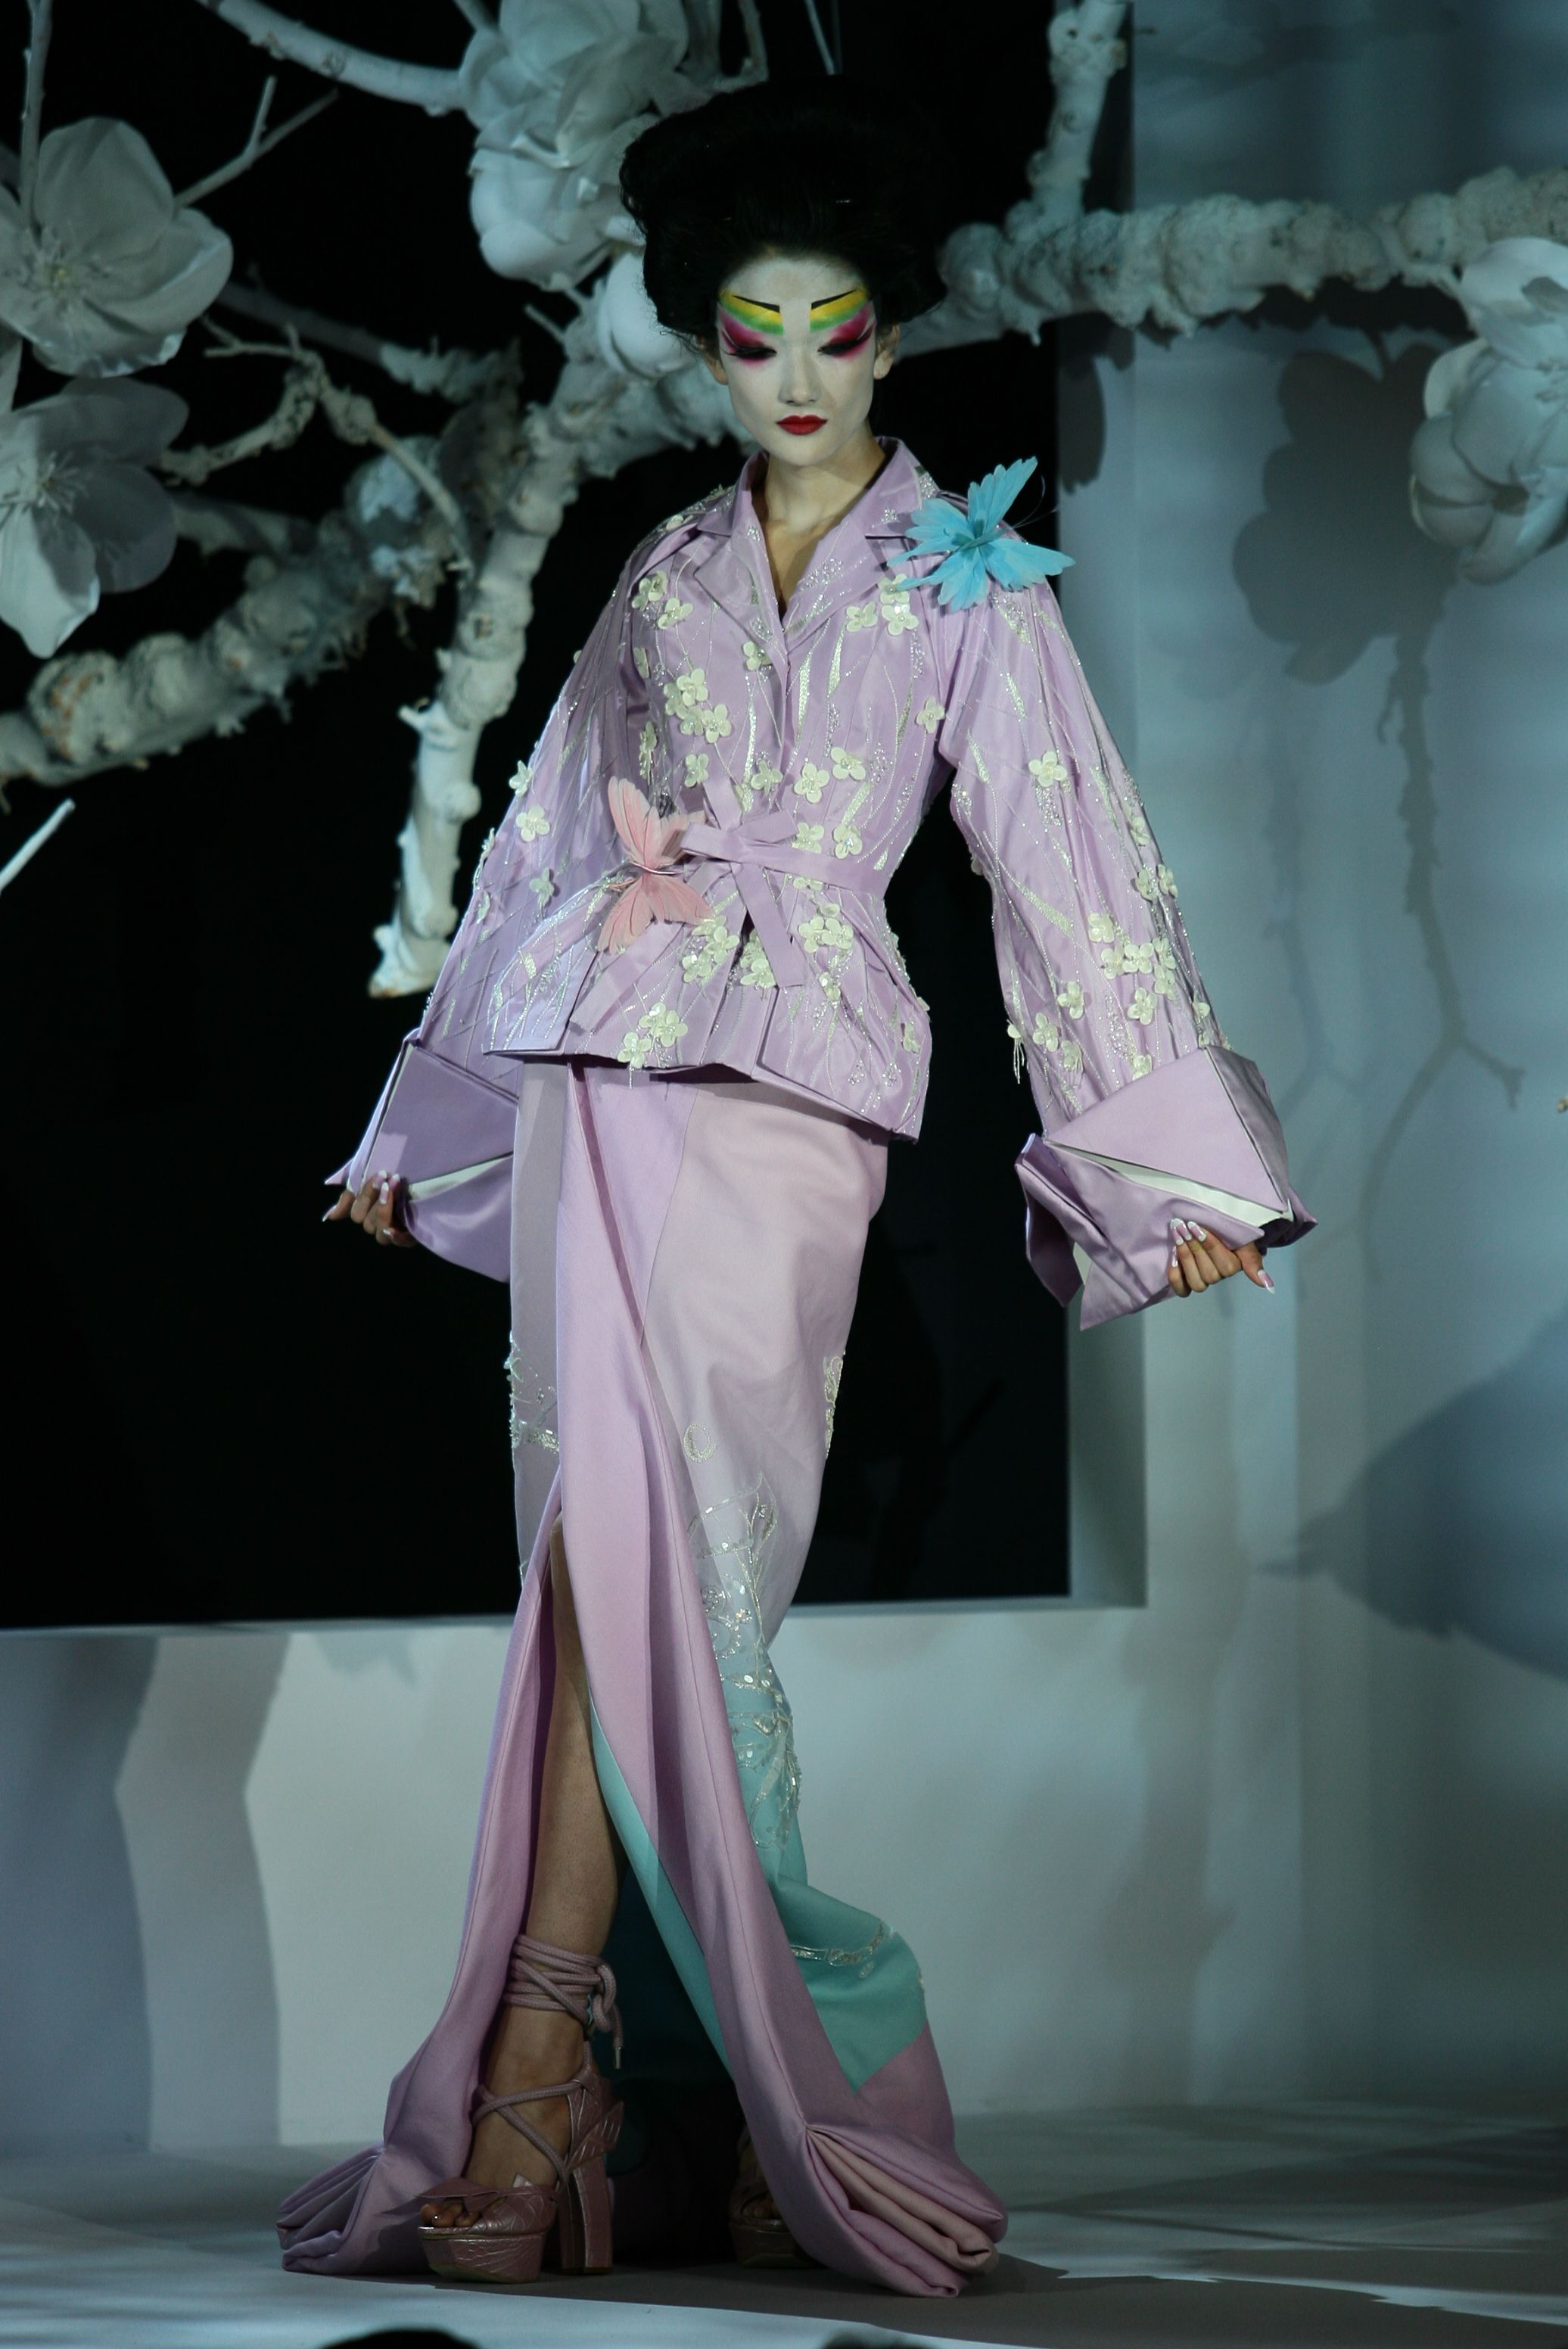 Ai Tominaga on the runway at Dior's spring 2007 haute couture show at the Polo de Paris. Christian Dior Spring 2007, Paris